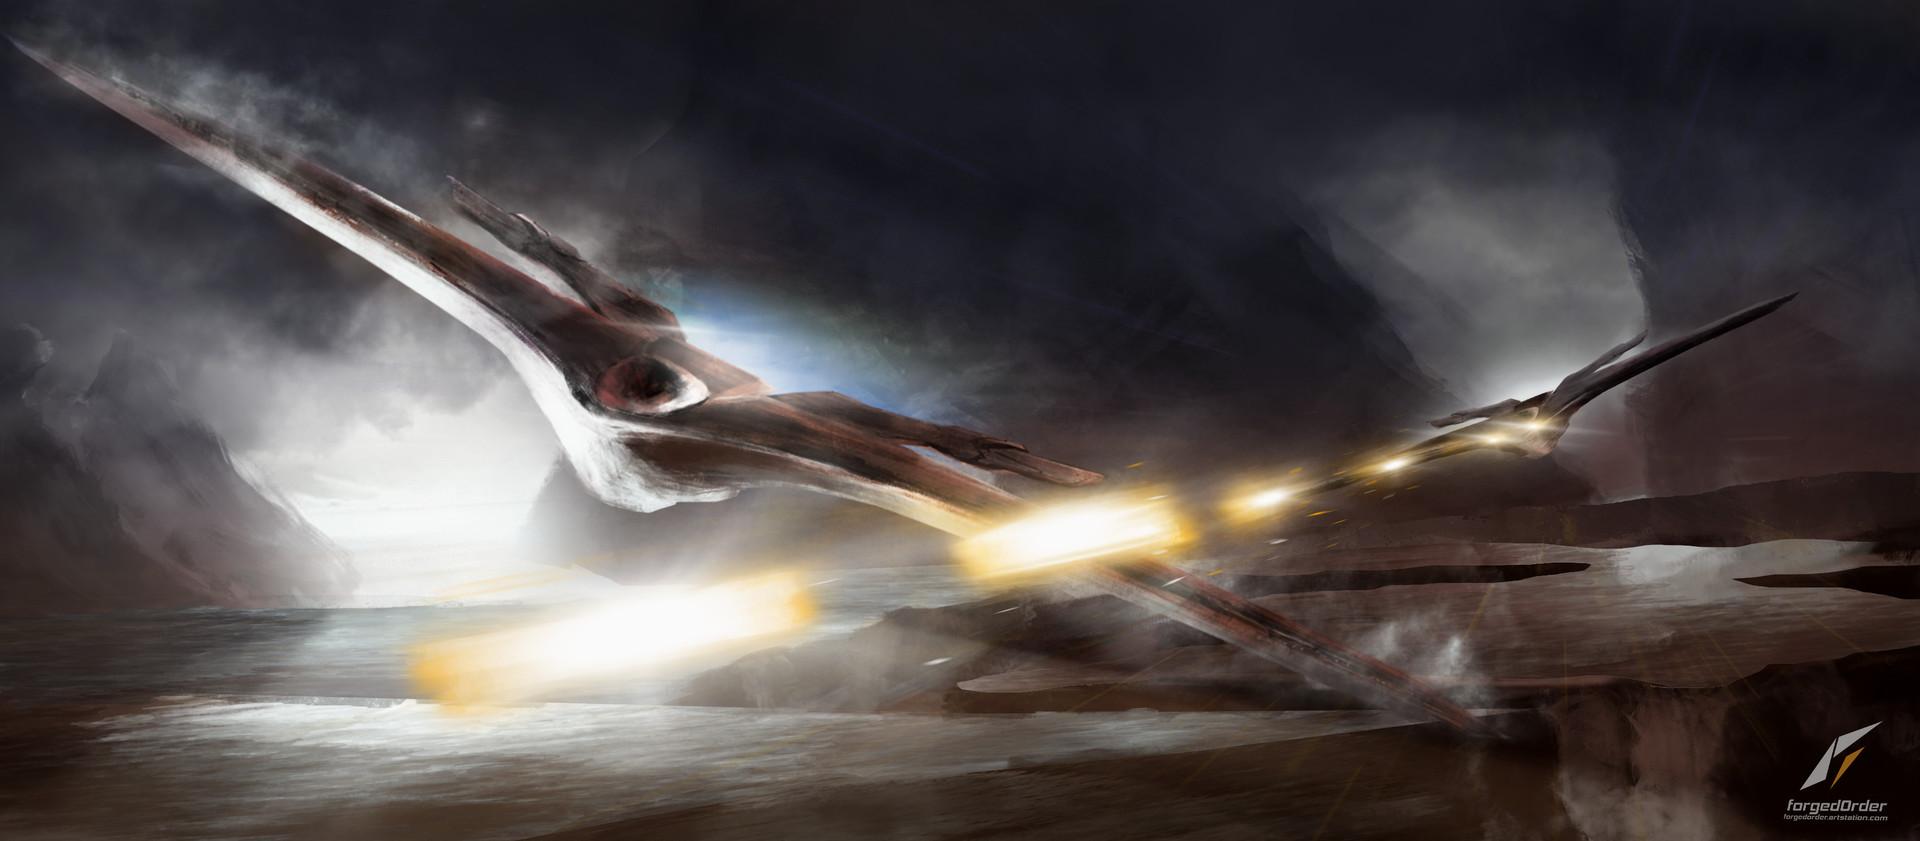 Attila gallik forgedorder spaceship logo